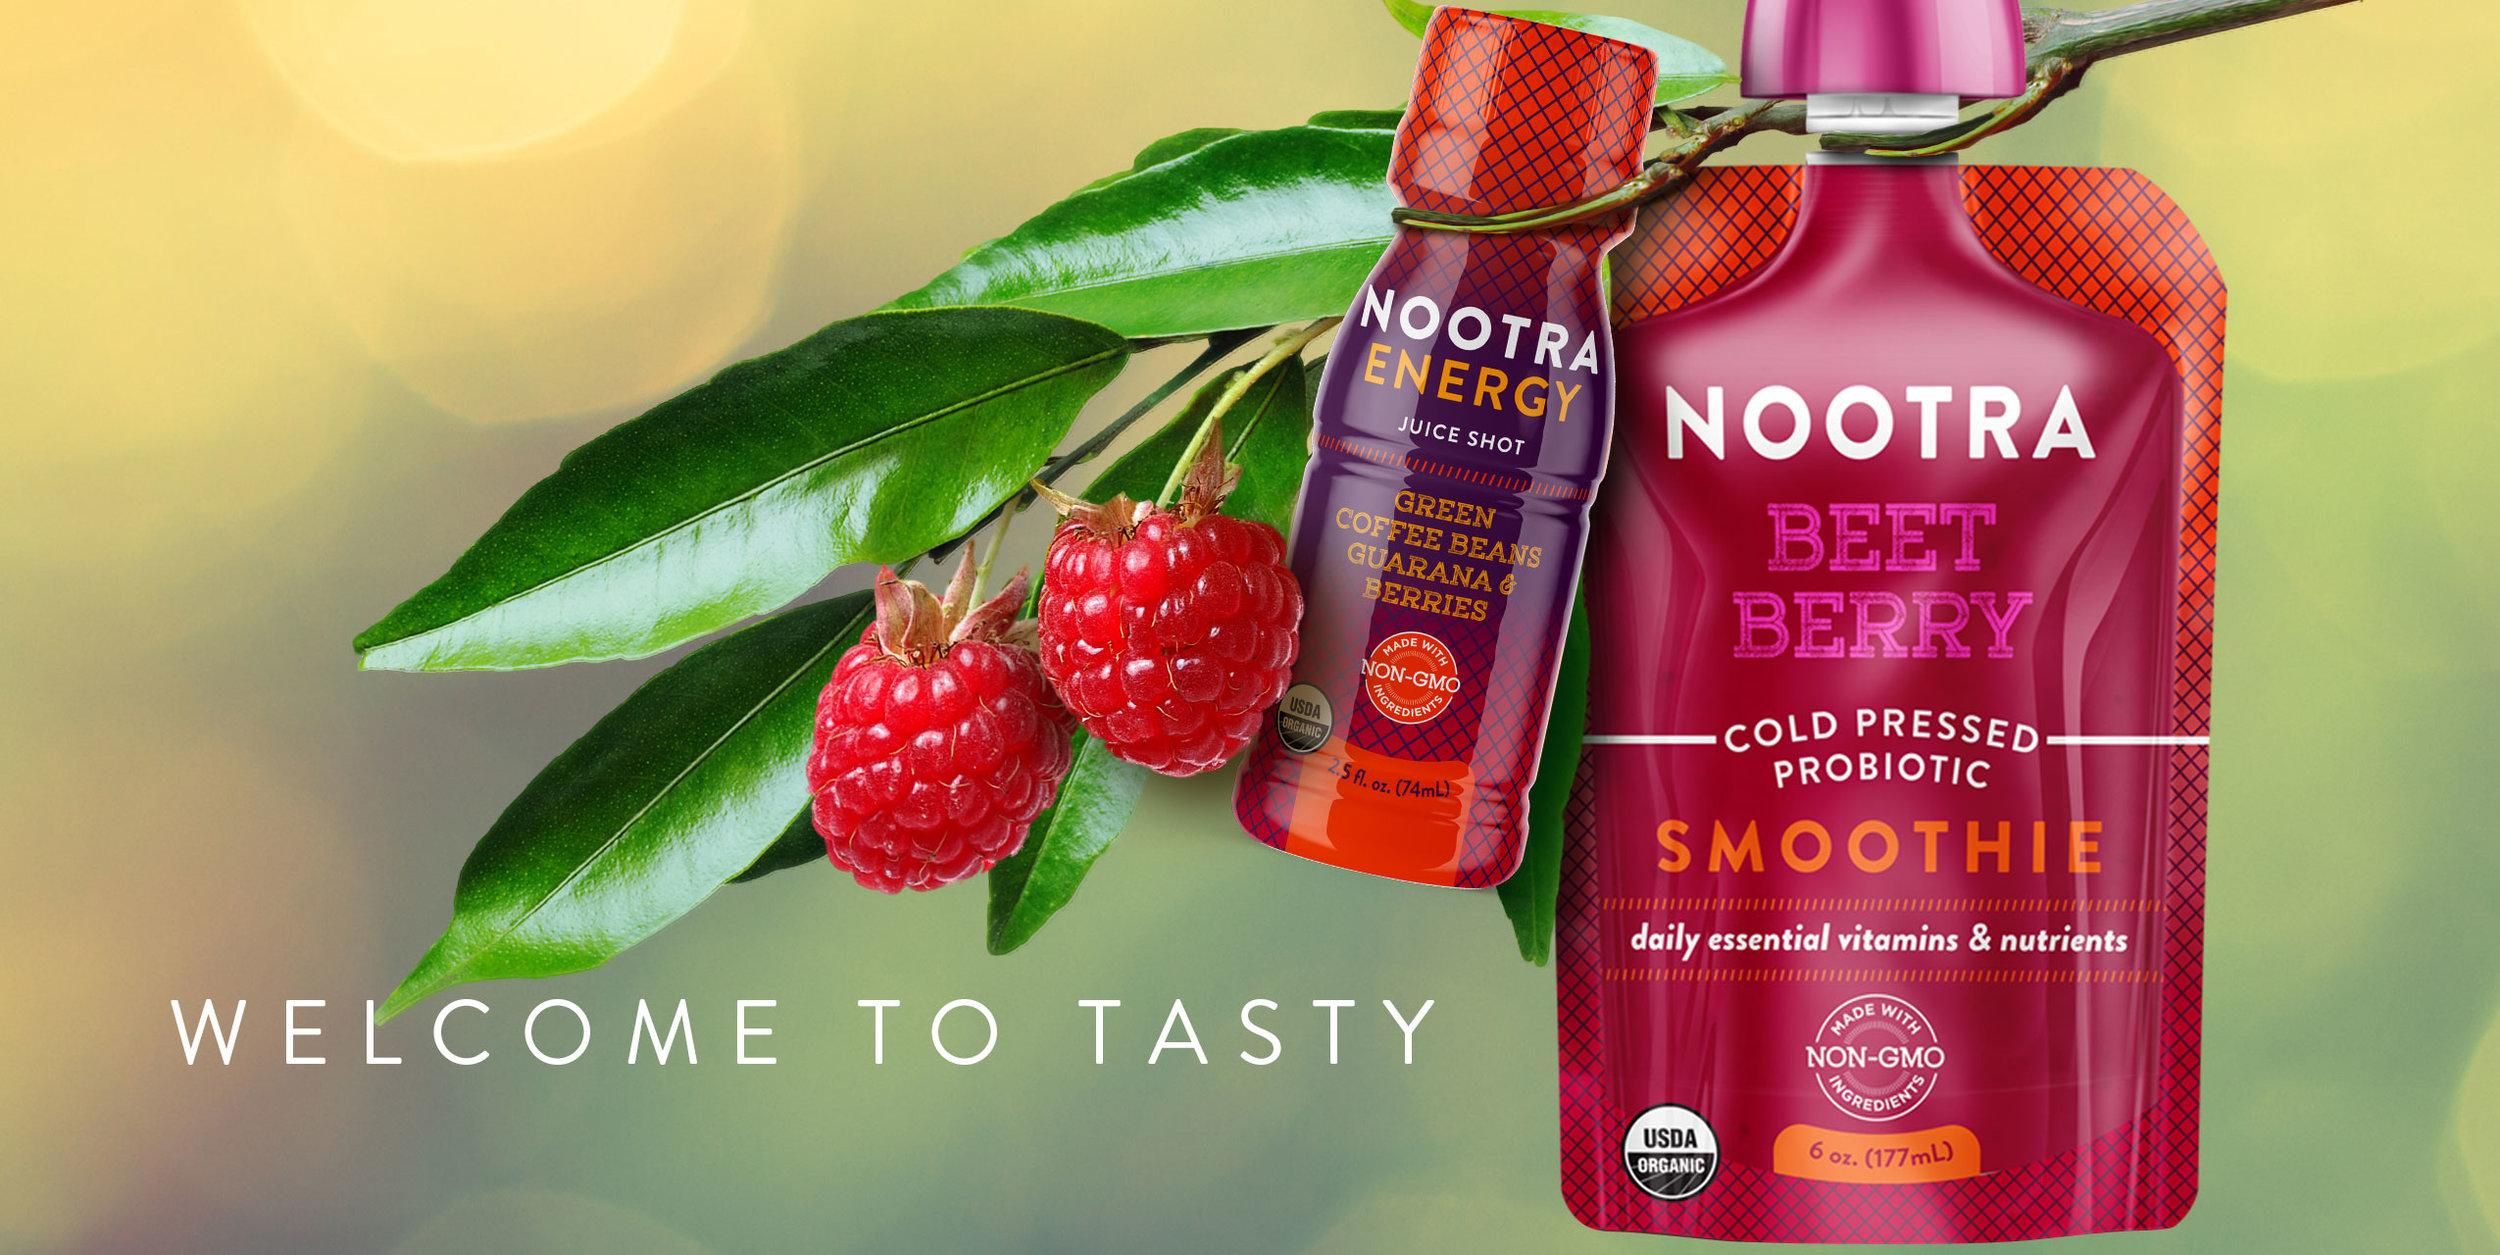 NOOTRA-WEB-LP-Berry-Beet-pb_Shot.jpg